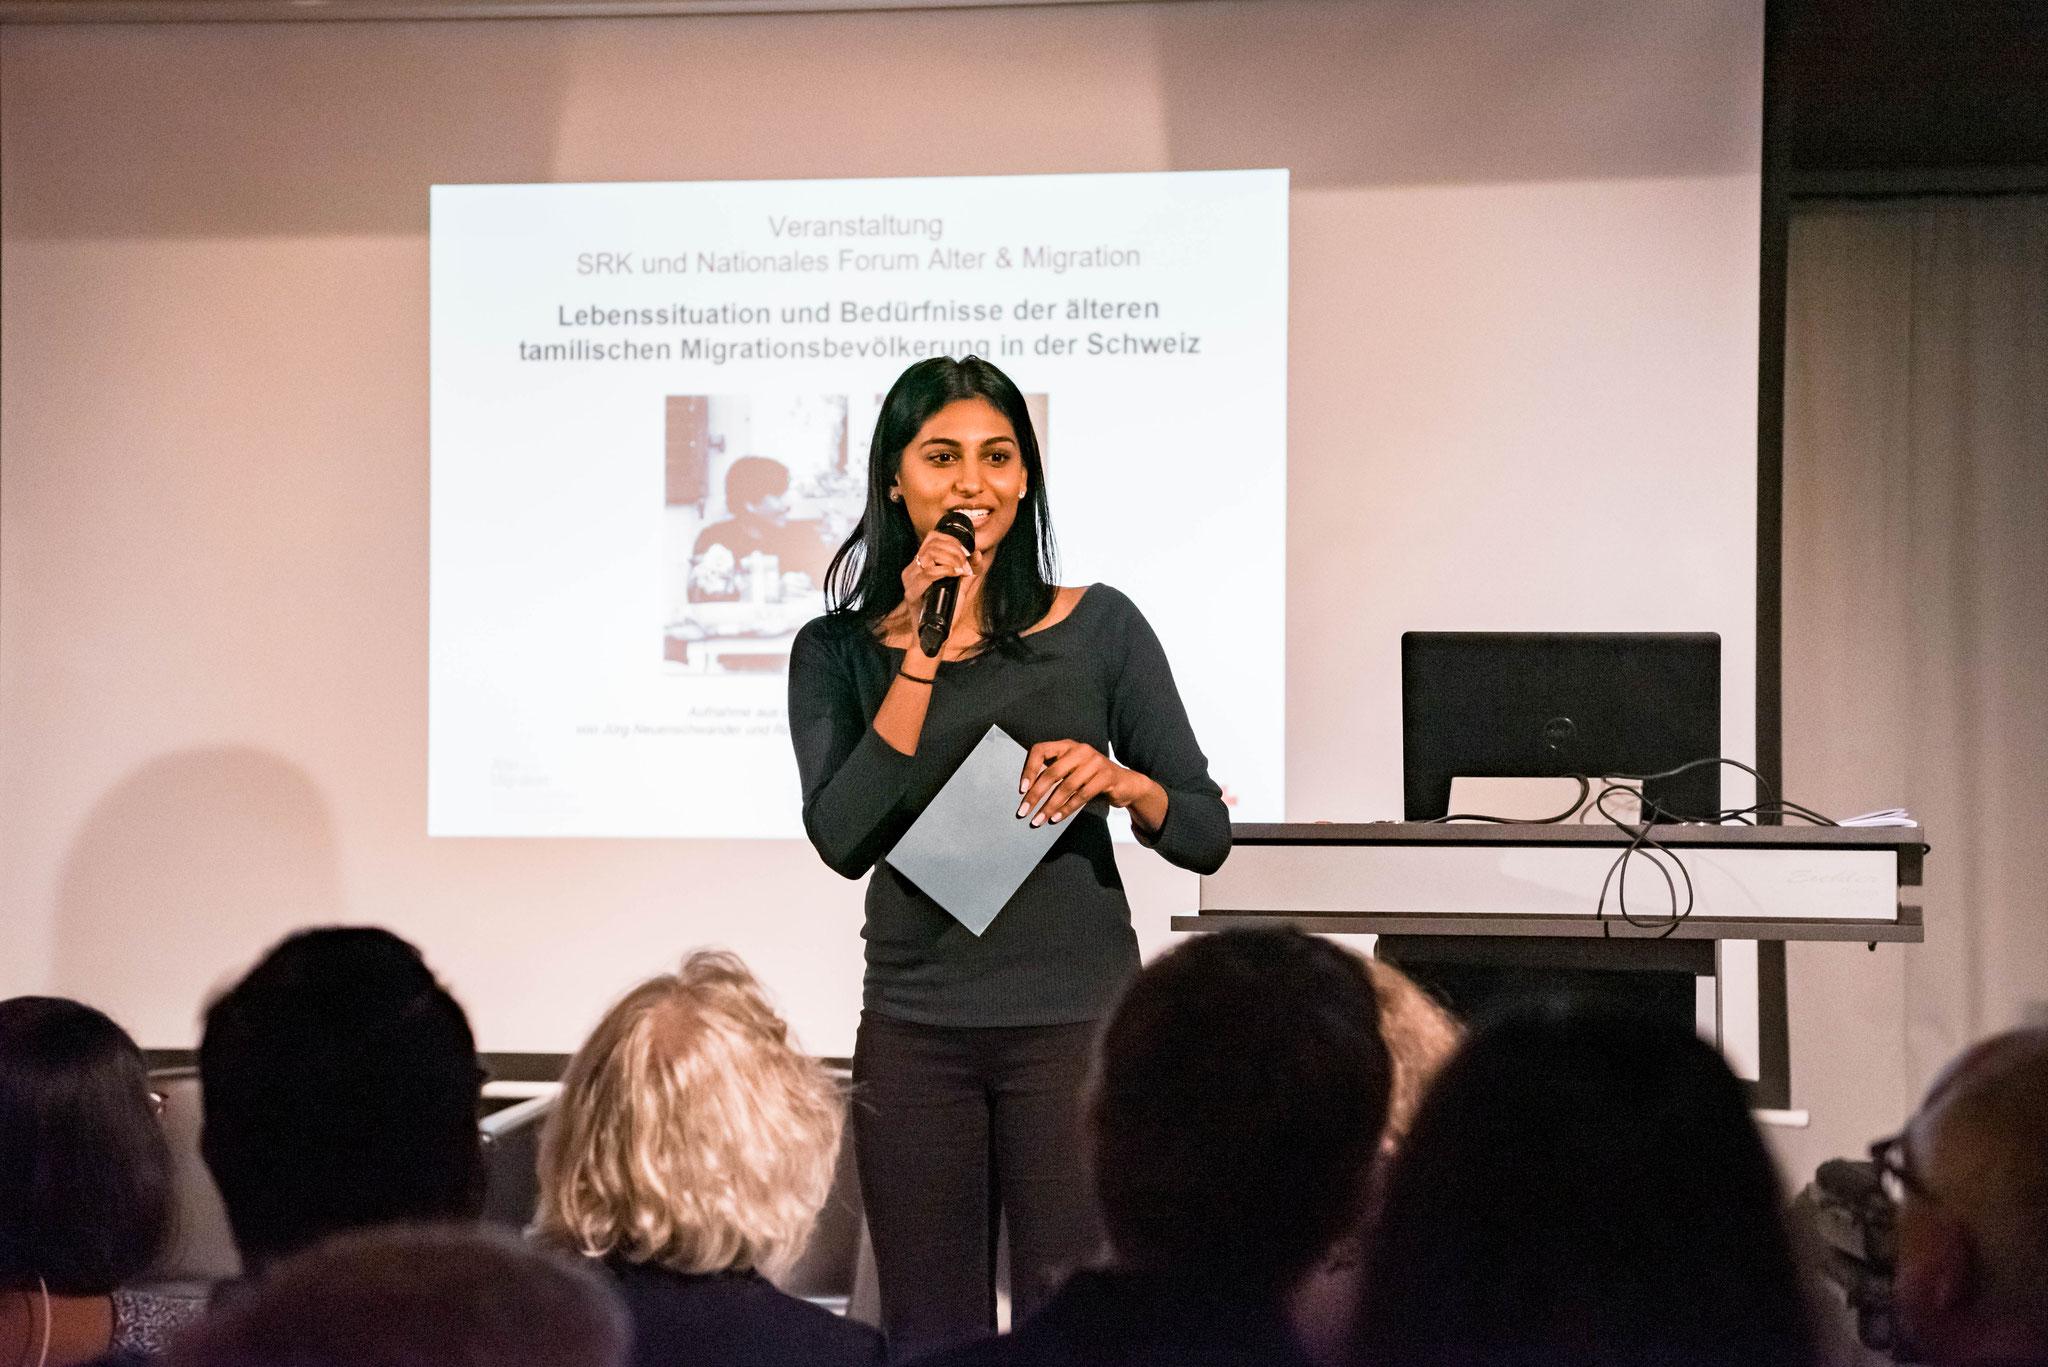 Anoya Thamotharampillai (Polit-Forum Bern)